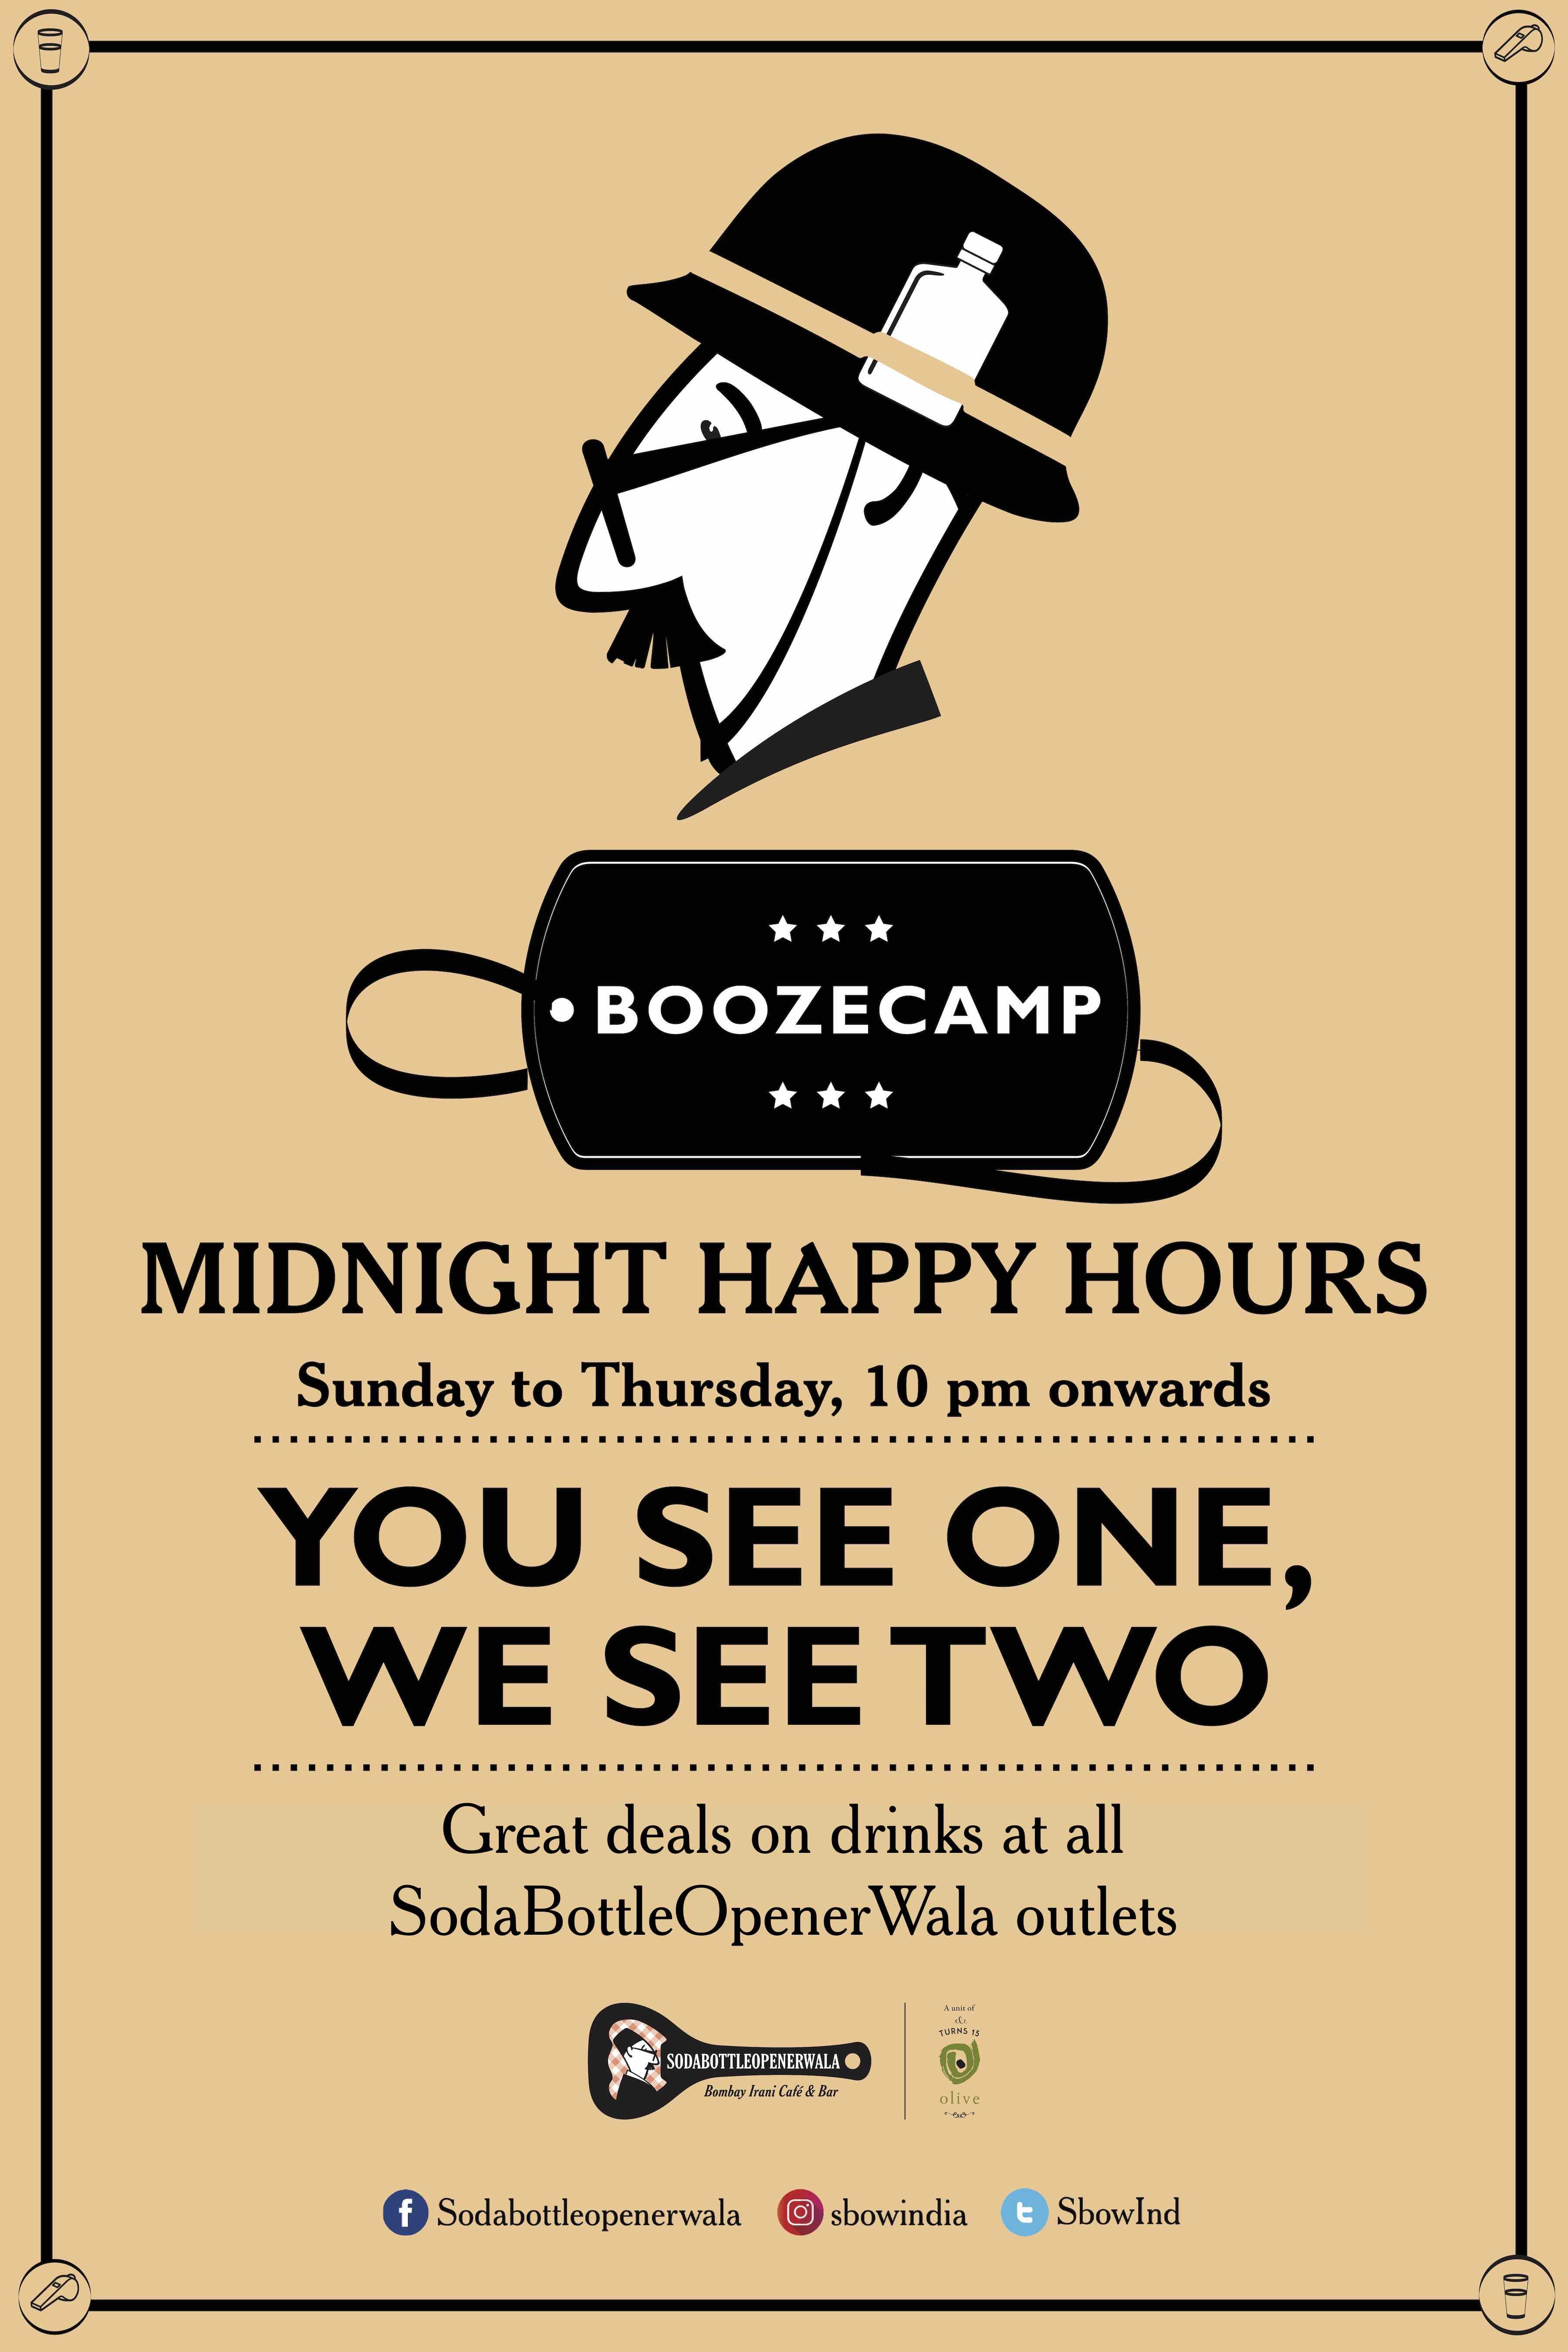 Midnigh Happy Hours at SodaBottleOpenerWala